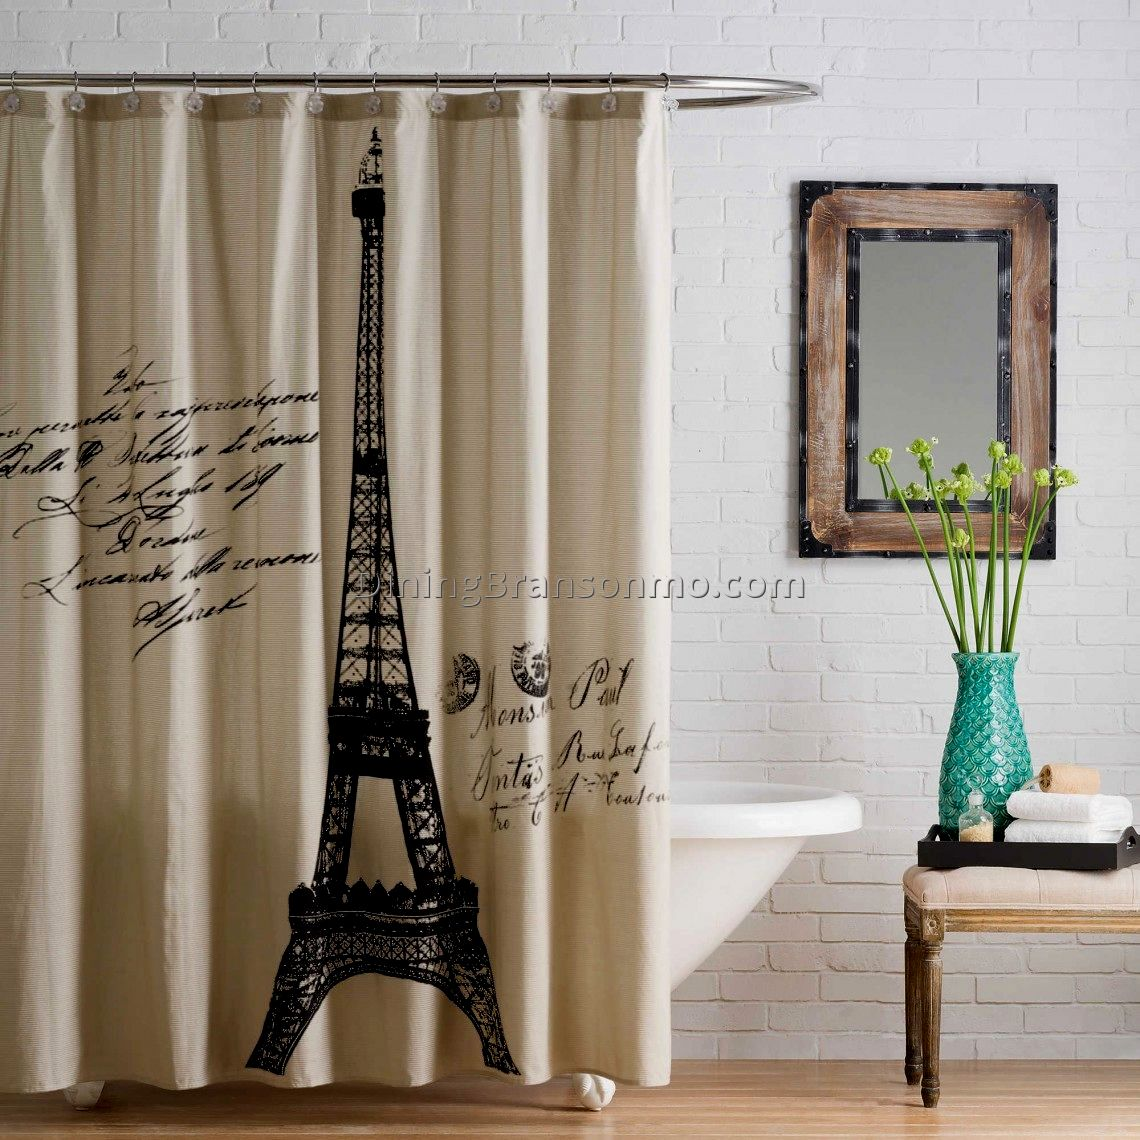 excellent target bathroom shower curtains concept-Awesome Target Bathroom Shower Curtains Plan